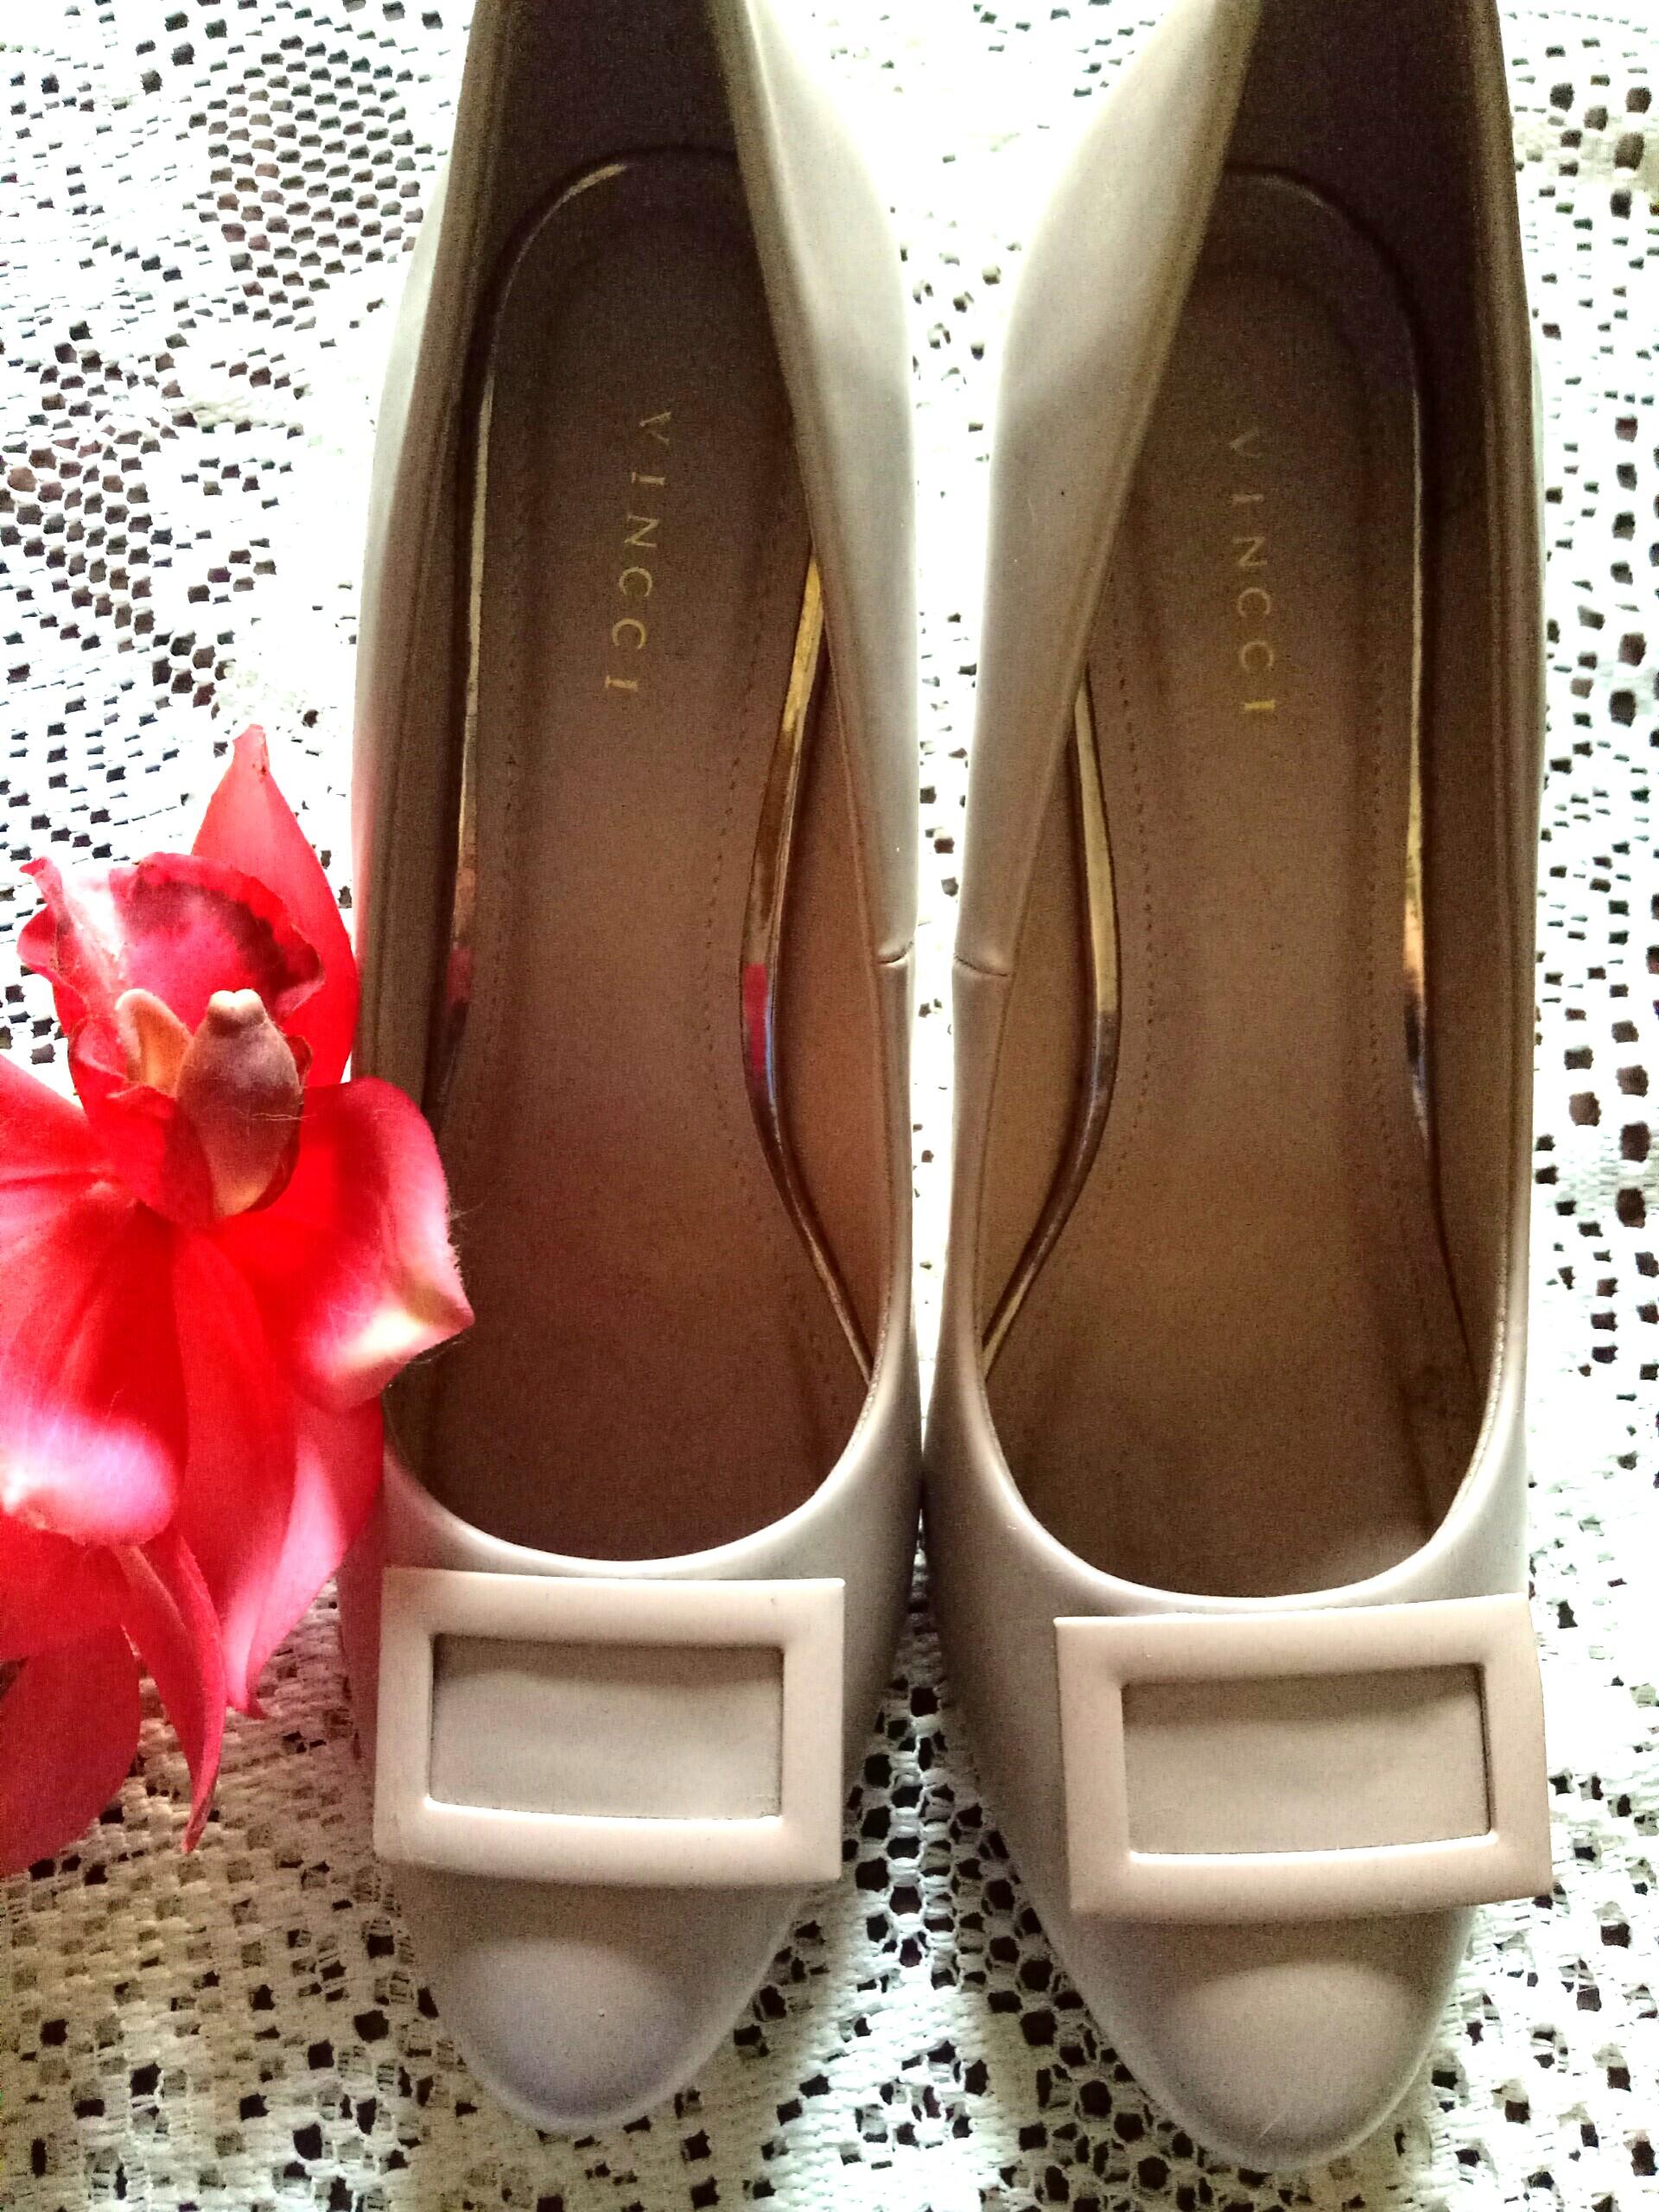 c4441ba4 VINCCI Heels, Women's Fashion, Shoes on Carousell